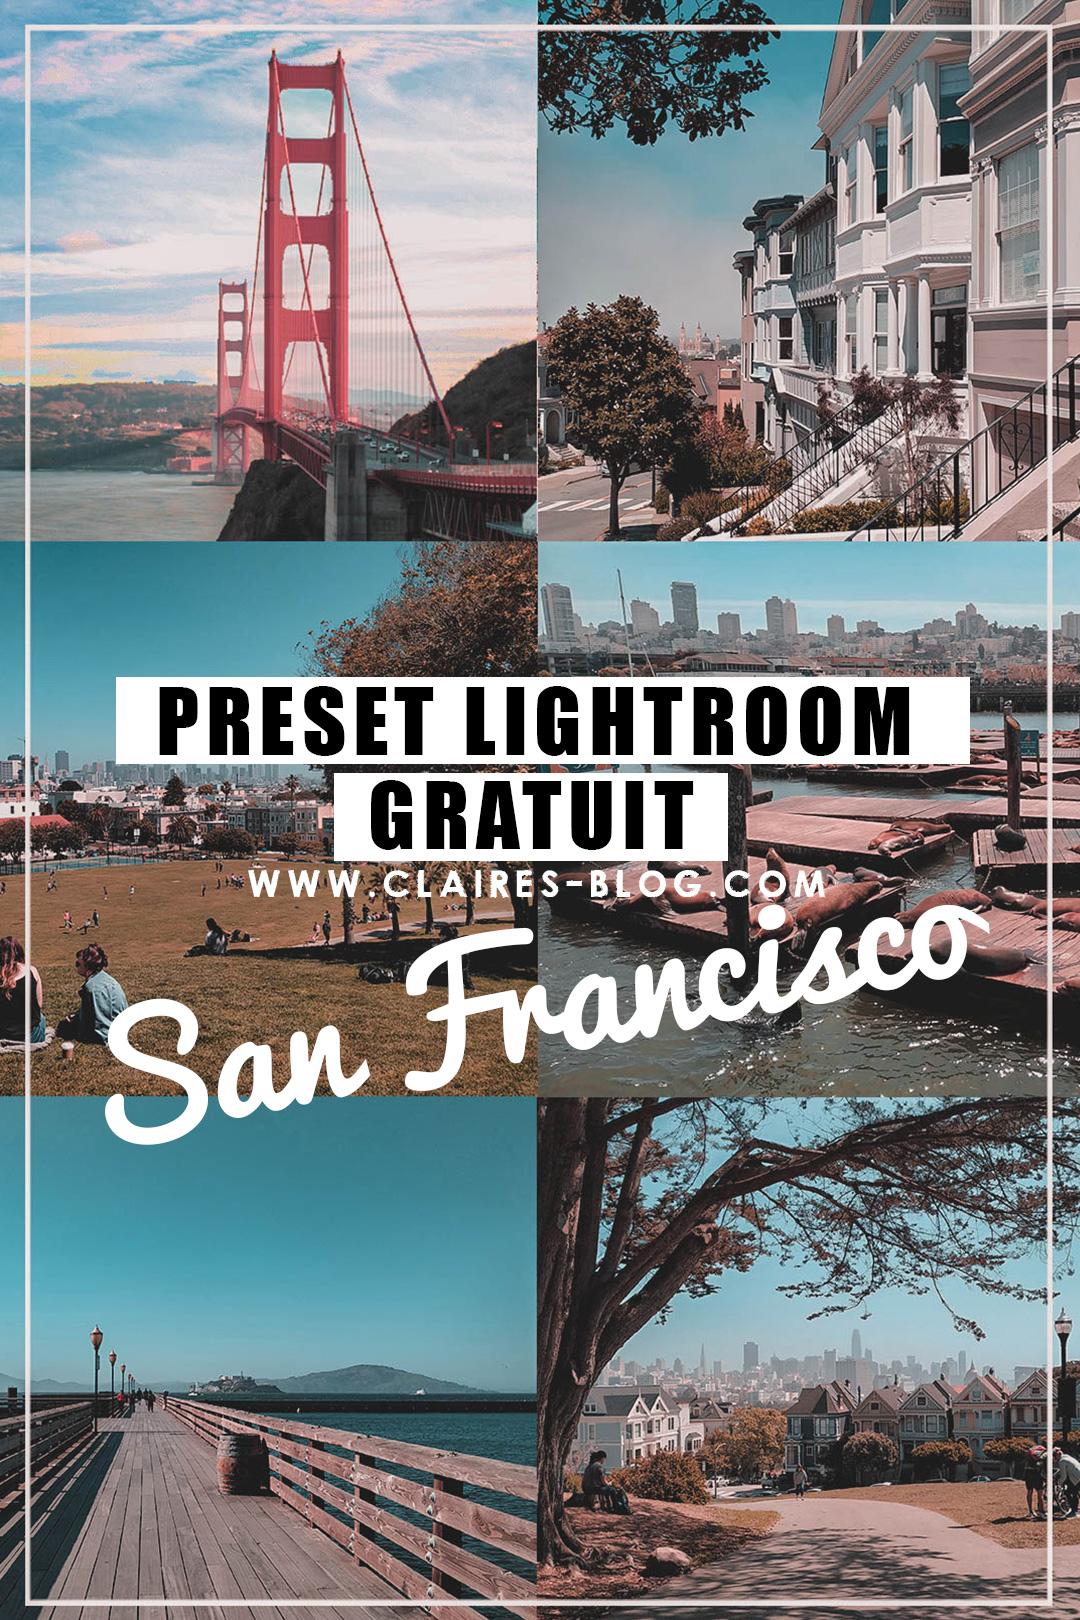 lightroom preset gratuit free